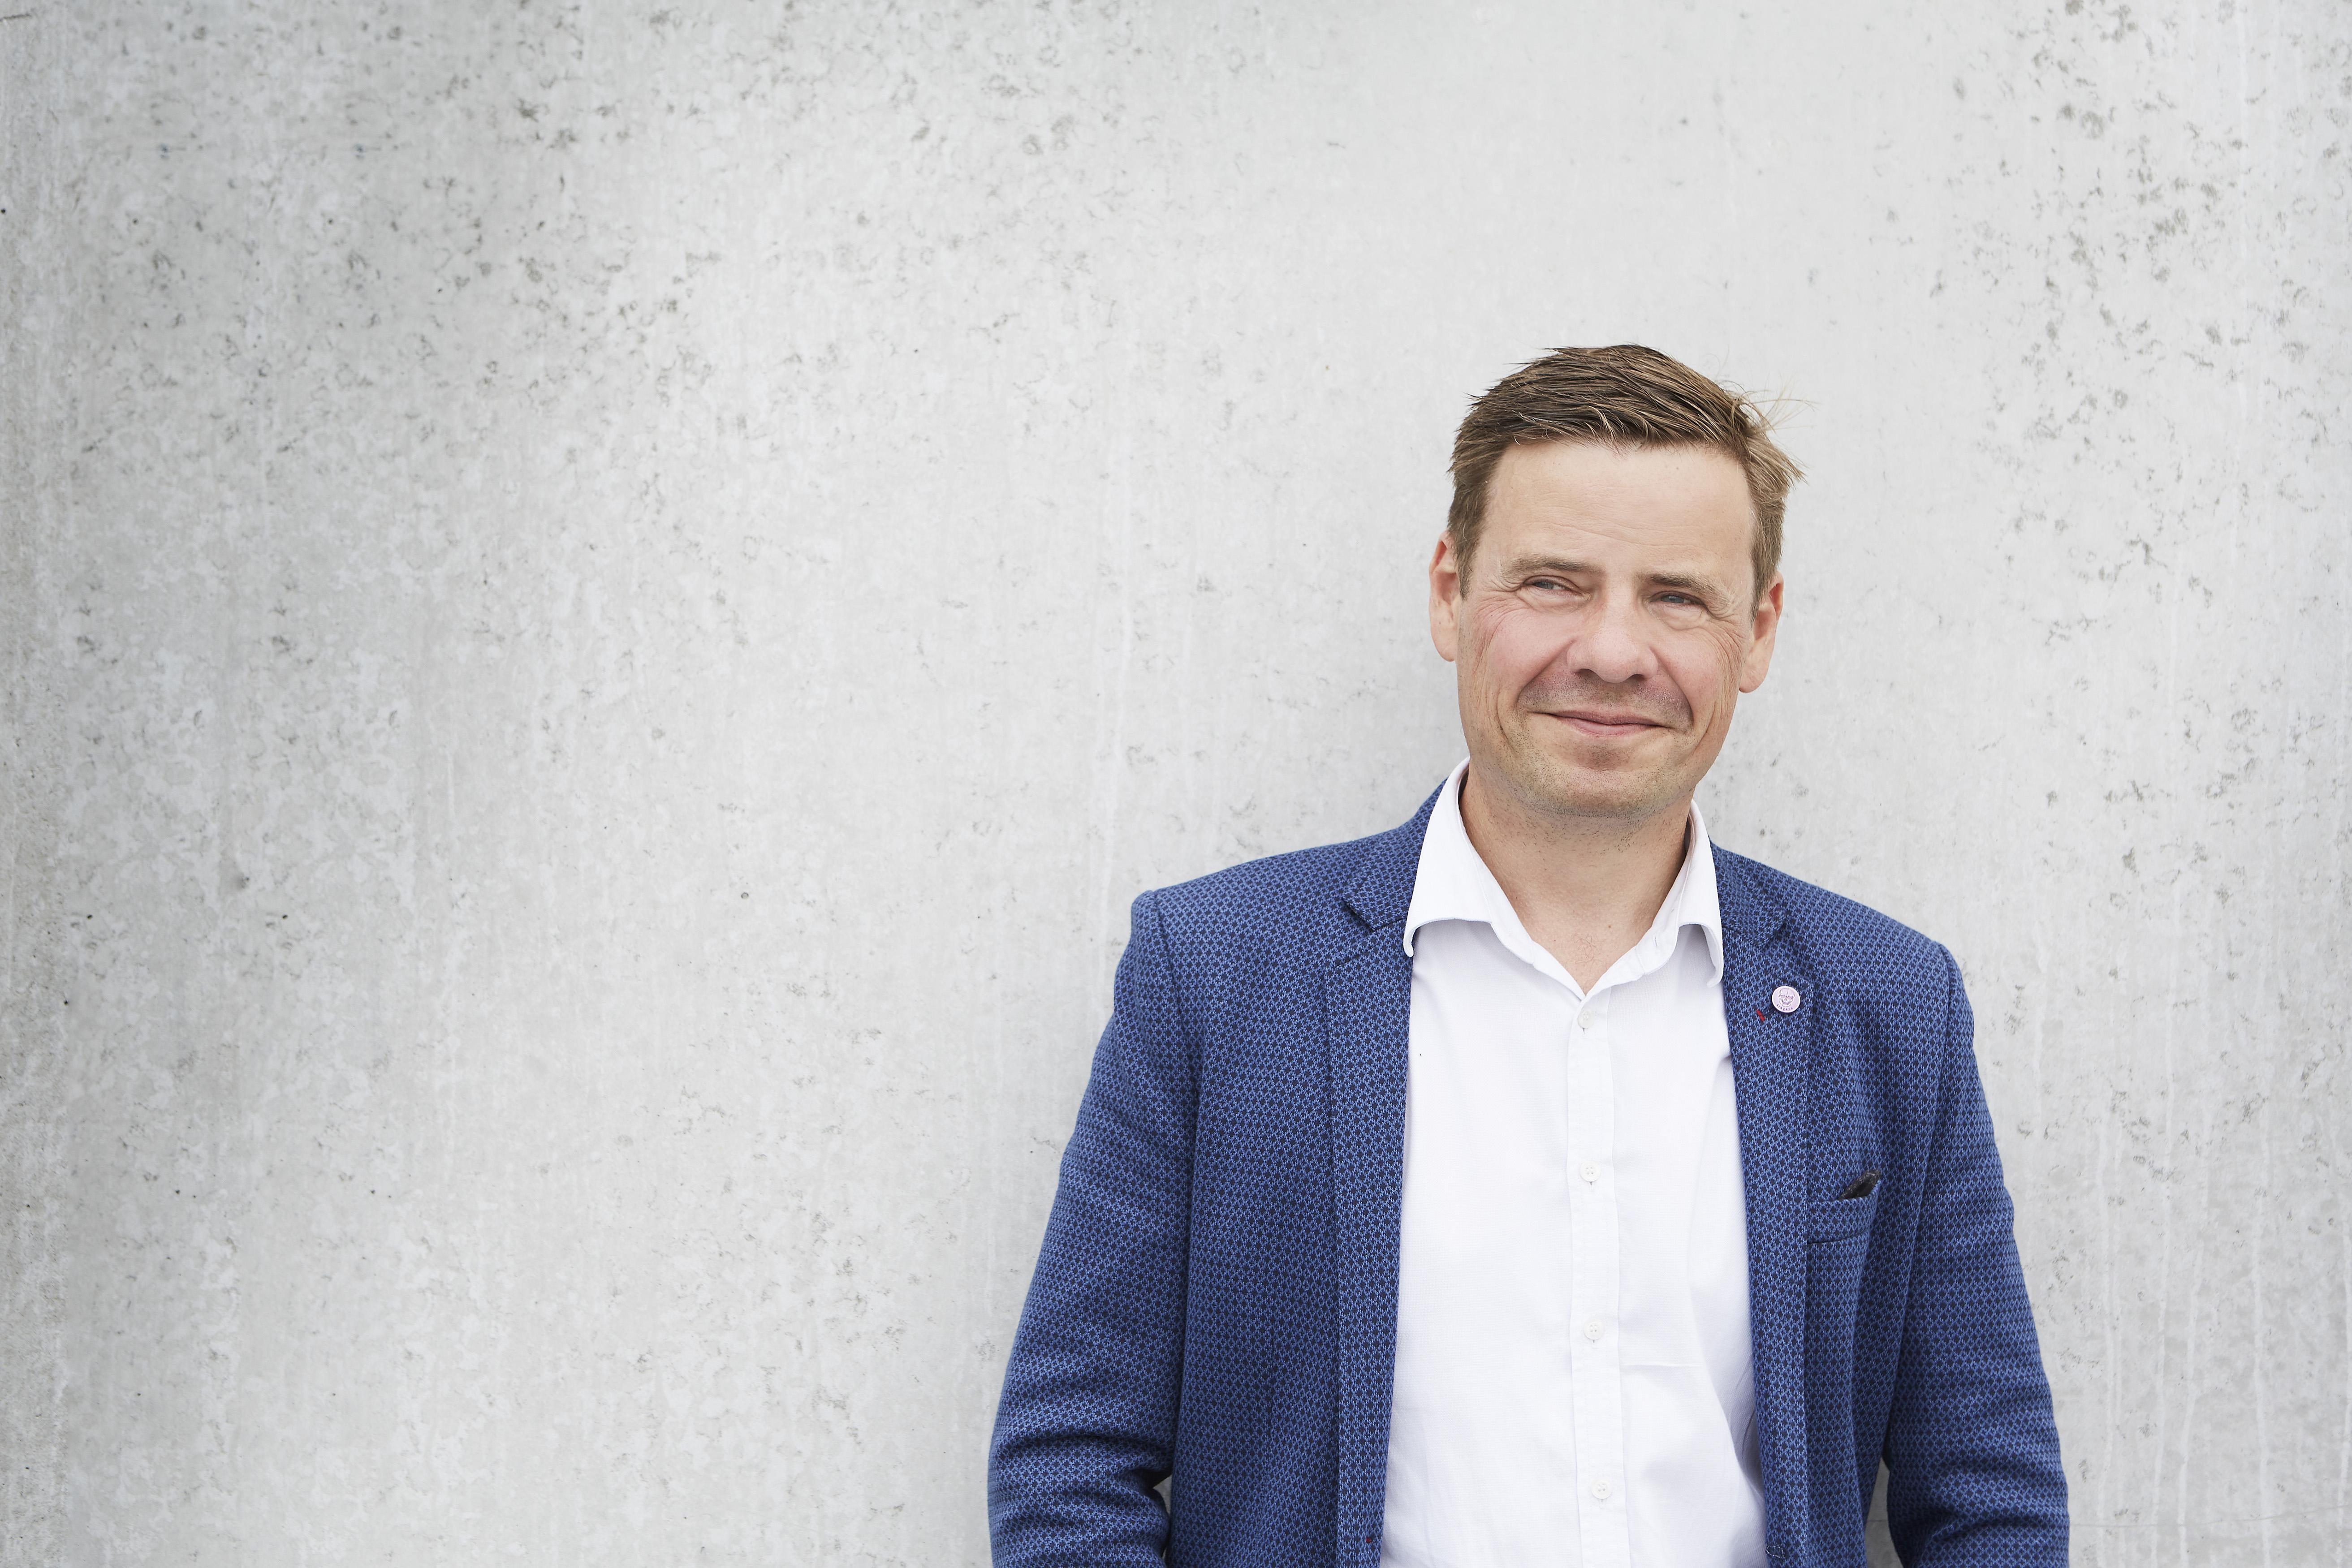 Thomas Kastrup Larsen, bestyrelsesformand i Aalborg Lufthavn. (Foto: thomaskastruplarsen.dk)